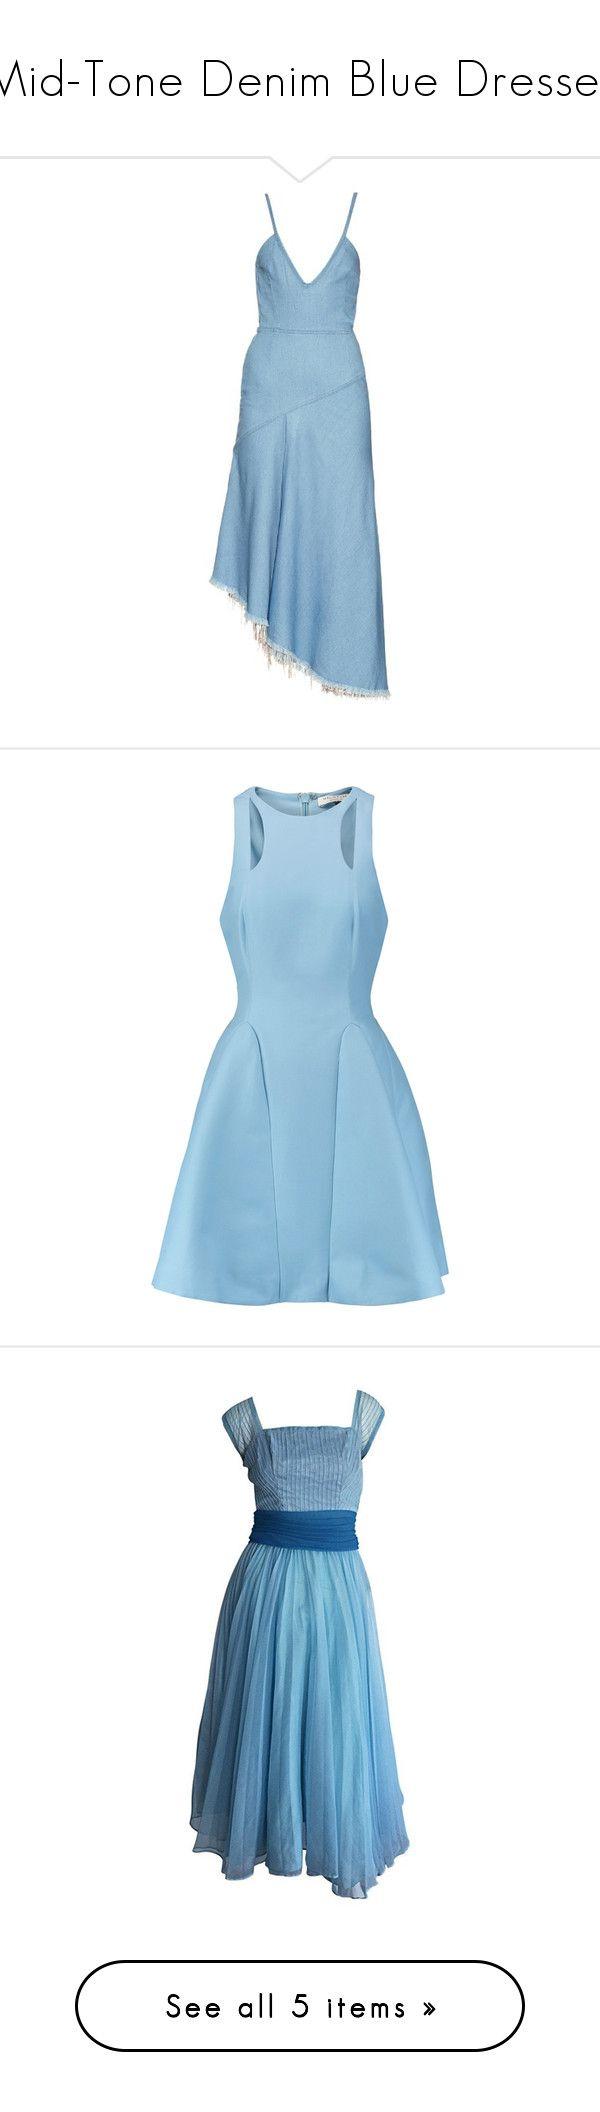 """Mid-Tone Denim Blue Dresses"" by tegan-b-riley on Polyvore featuring dresses, blue denim dress, plunge-neck dresses, asymmetric midi dress, blue asymmetrical dress, mid calf dresses, sky blue, blue dress, blue skater skirt and circle skirts"